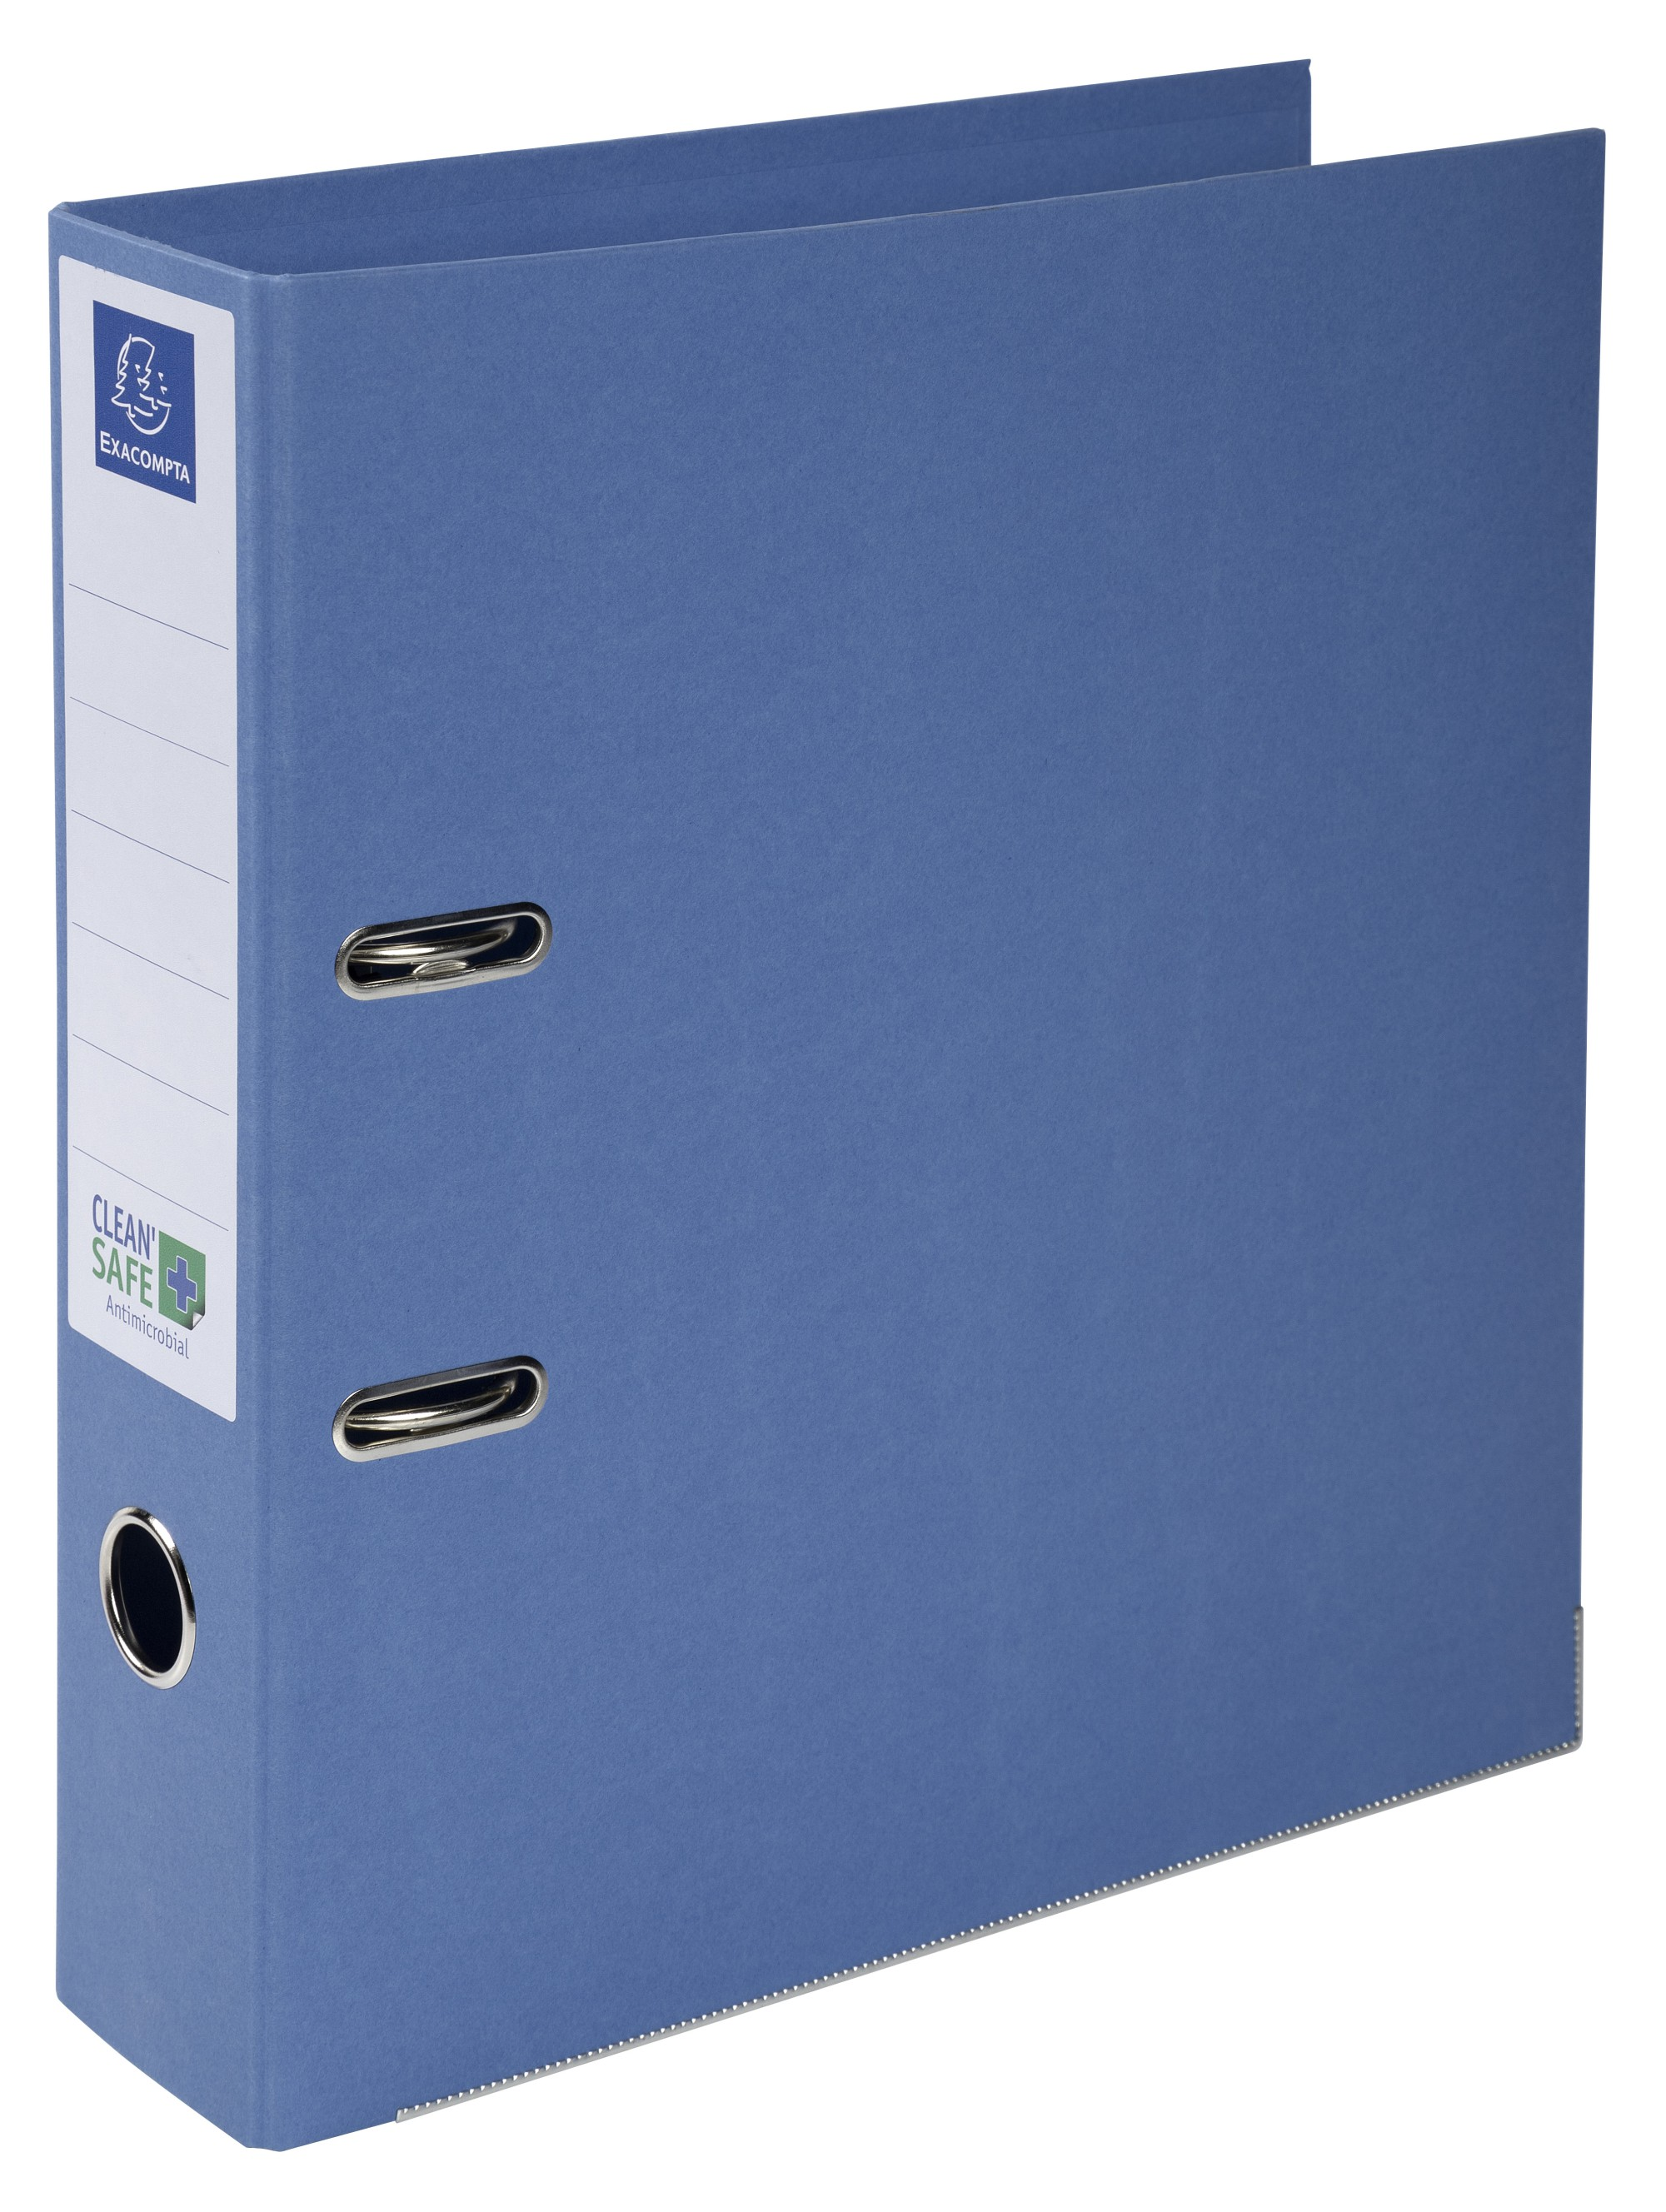 Exacompta, Clean'Safe Ordner A4, Rücken 70mm - Blau